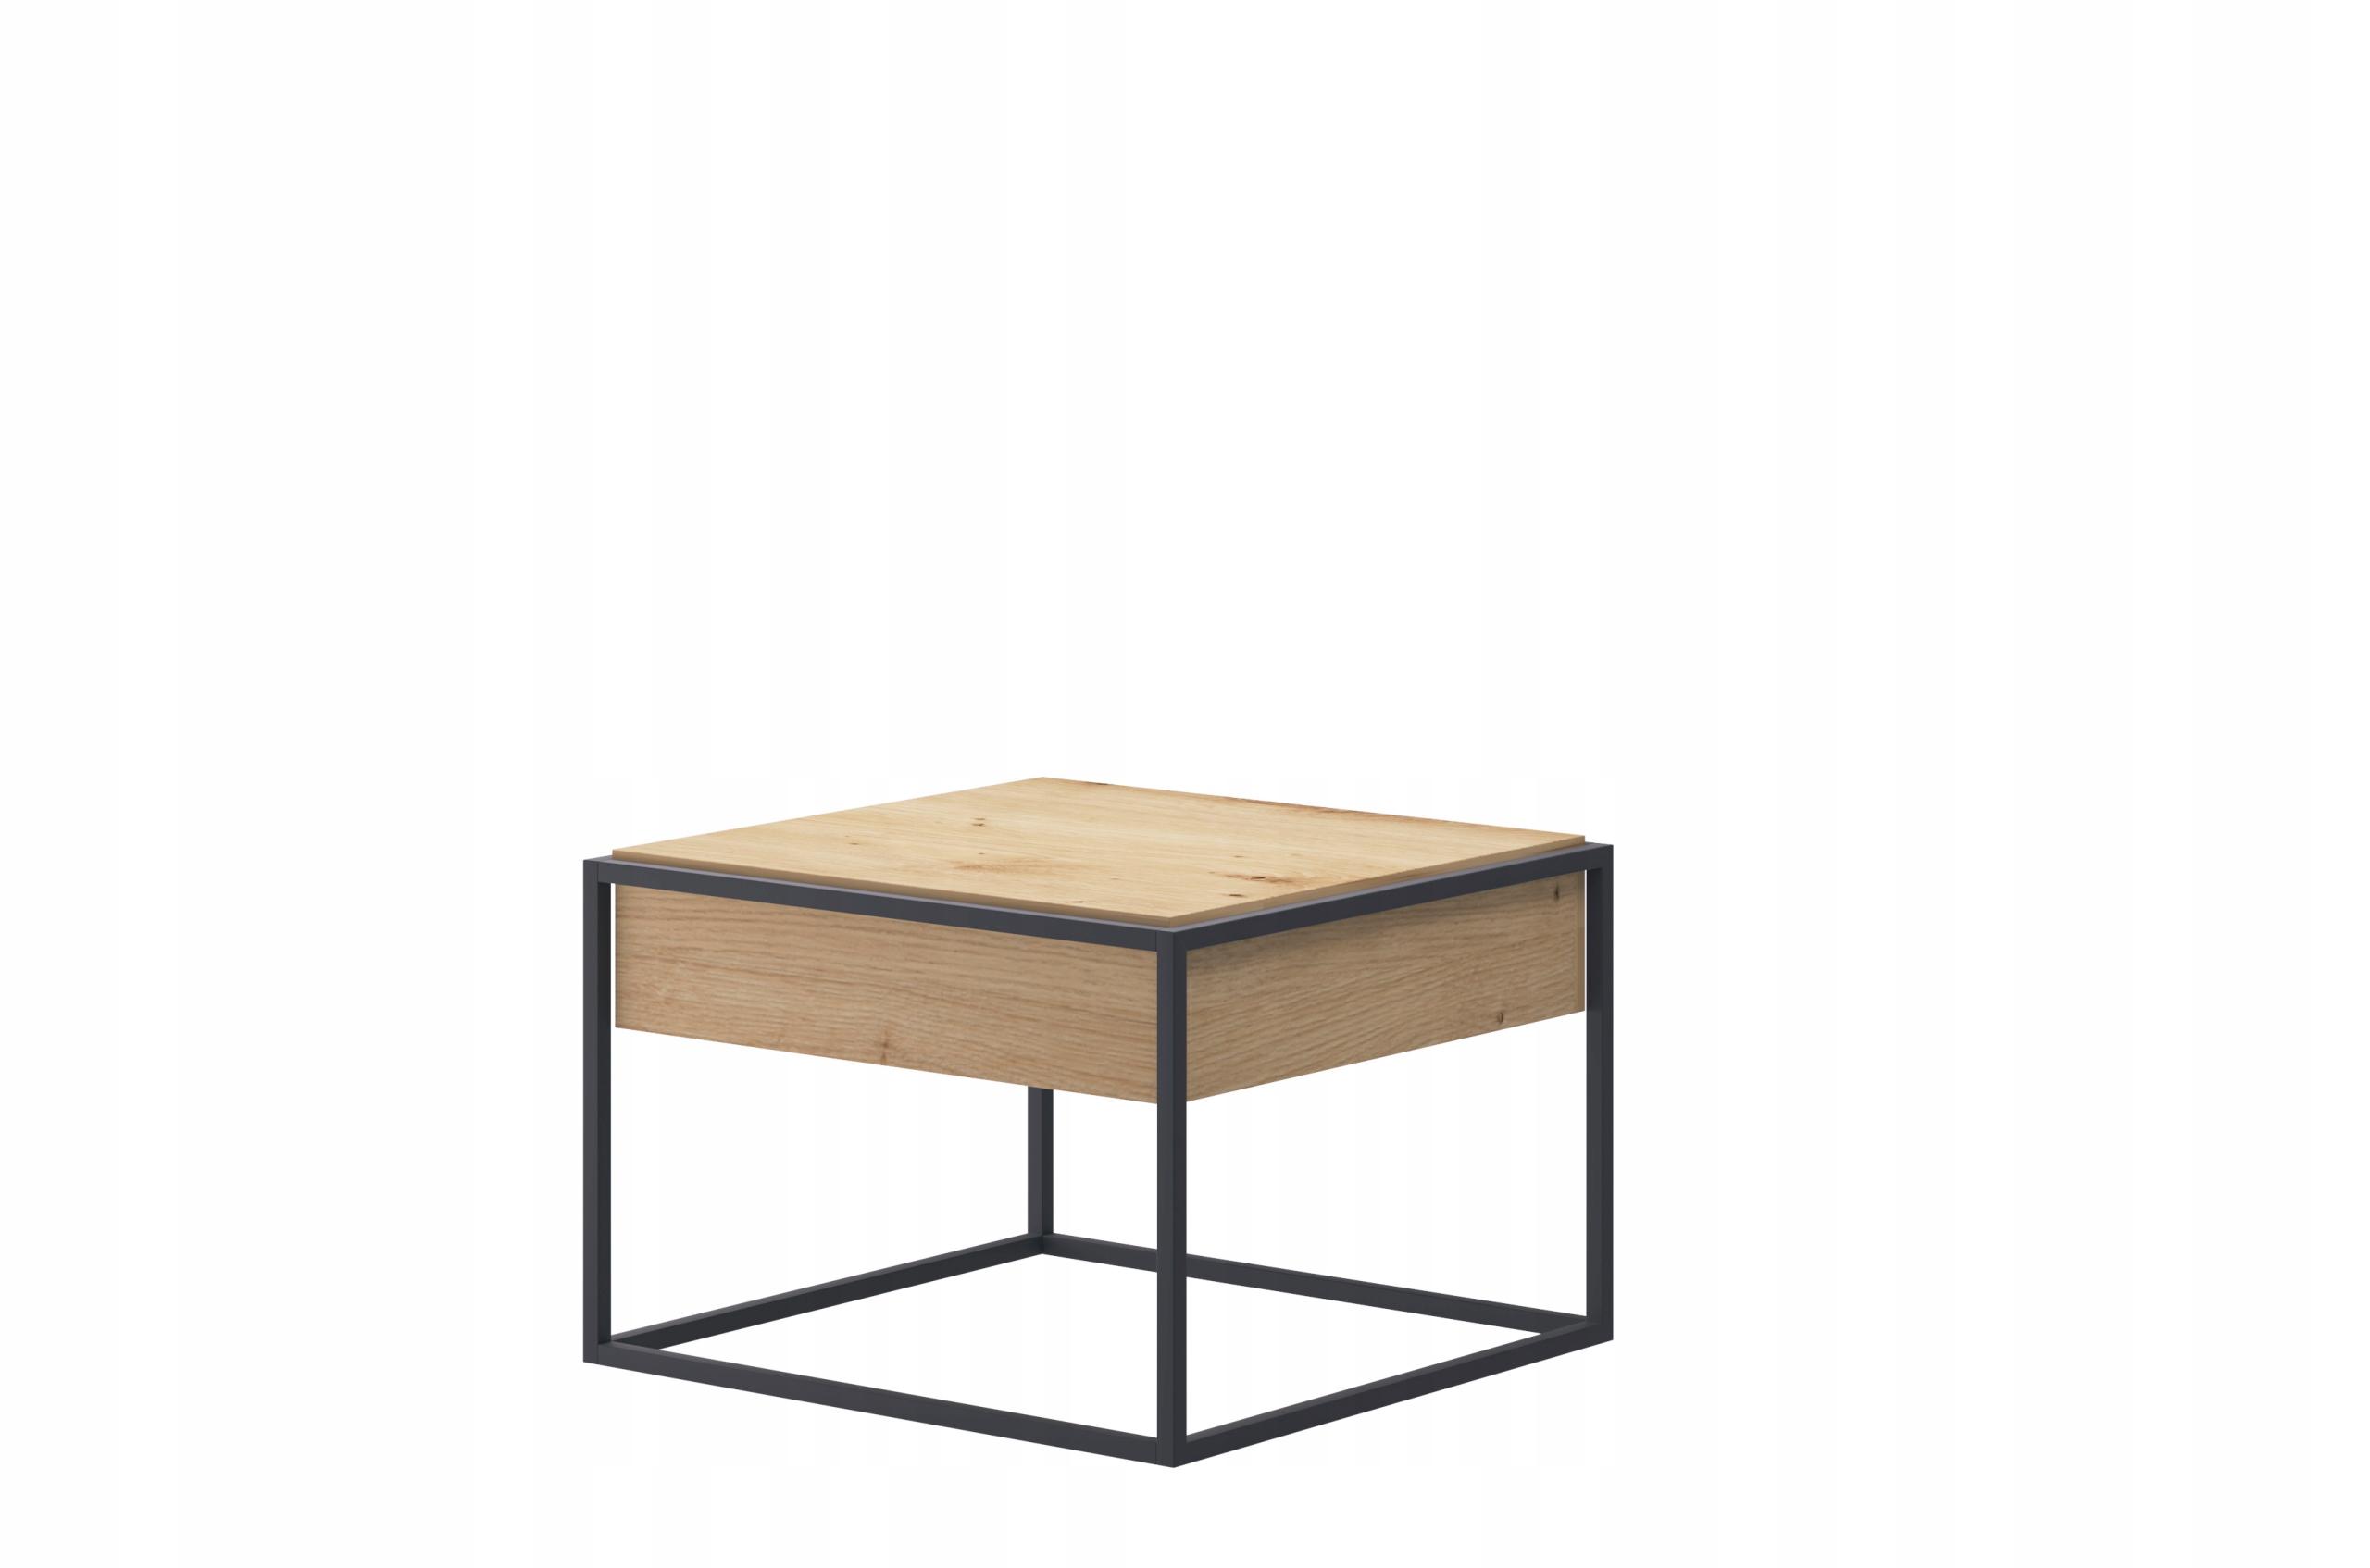 Konferenčný STOLÍK konferenčný stolík priemyselné ROČNÍKA, 60 cm - systém